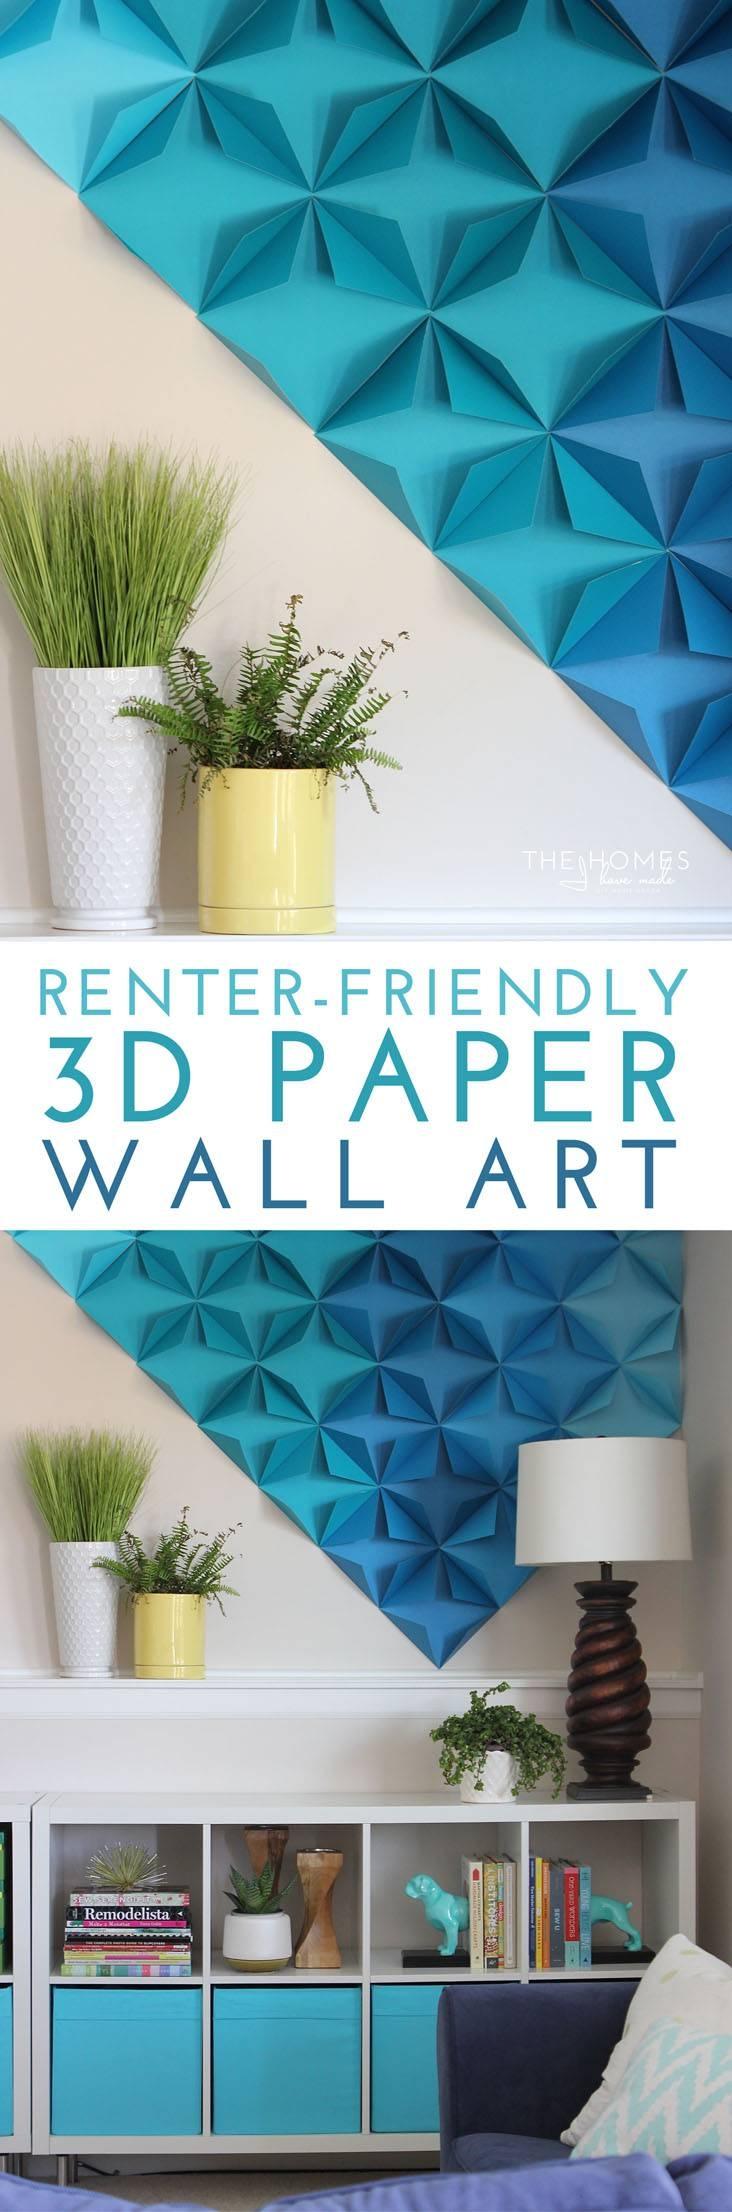 Renter Friendly 3D Paper Wall Art Throughout Current 3D Paper Wall Art (View 23 of 25)